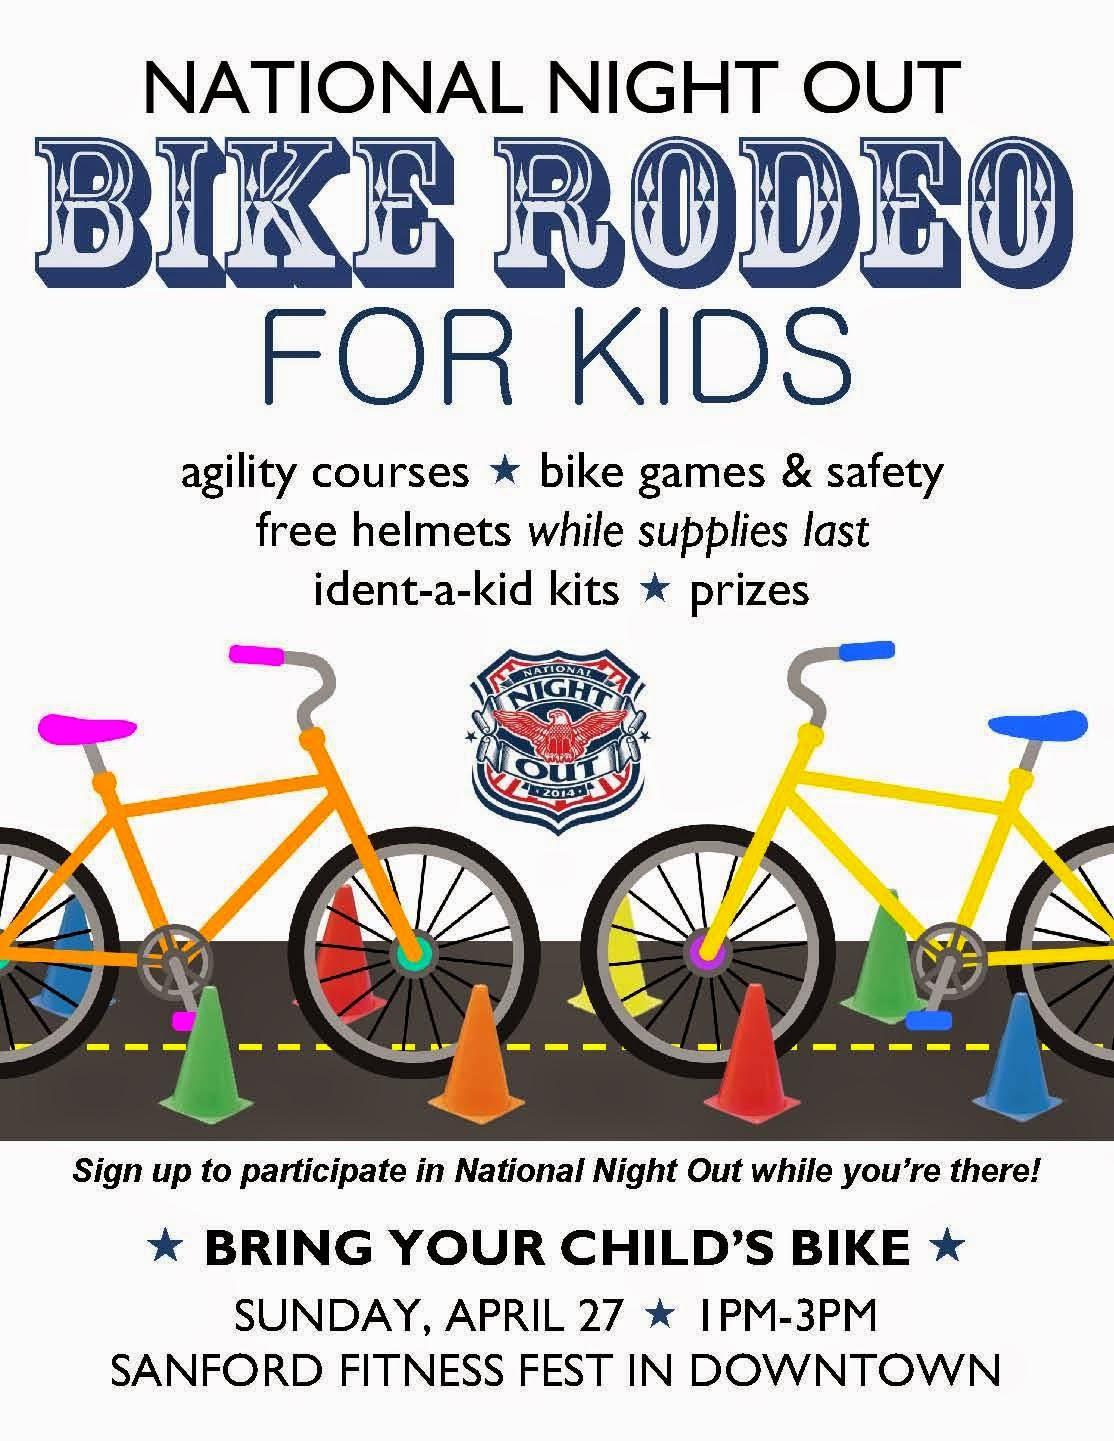 city of sanford nc nno kicks off with free bike rodeo for kids. Black Bedroom Furniture Sets. Home Design Ideas